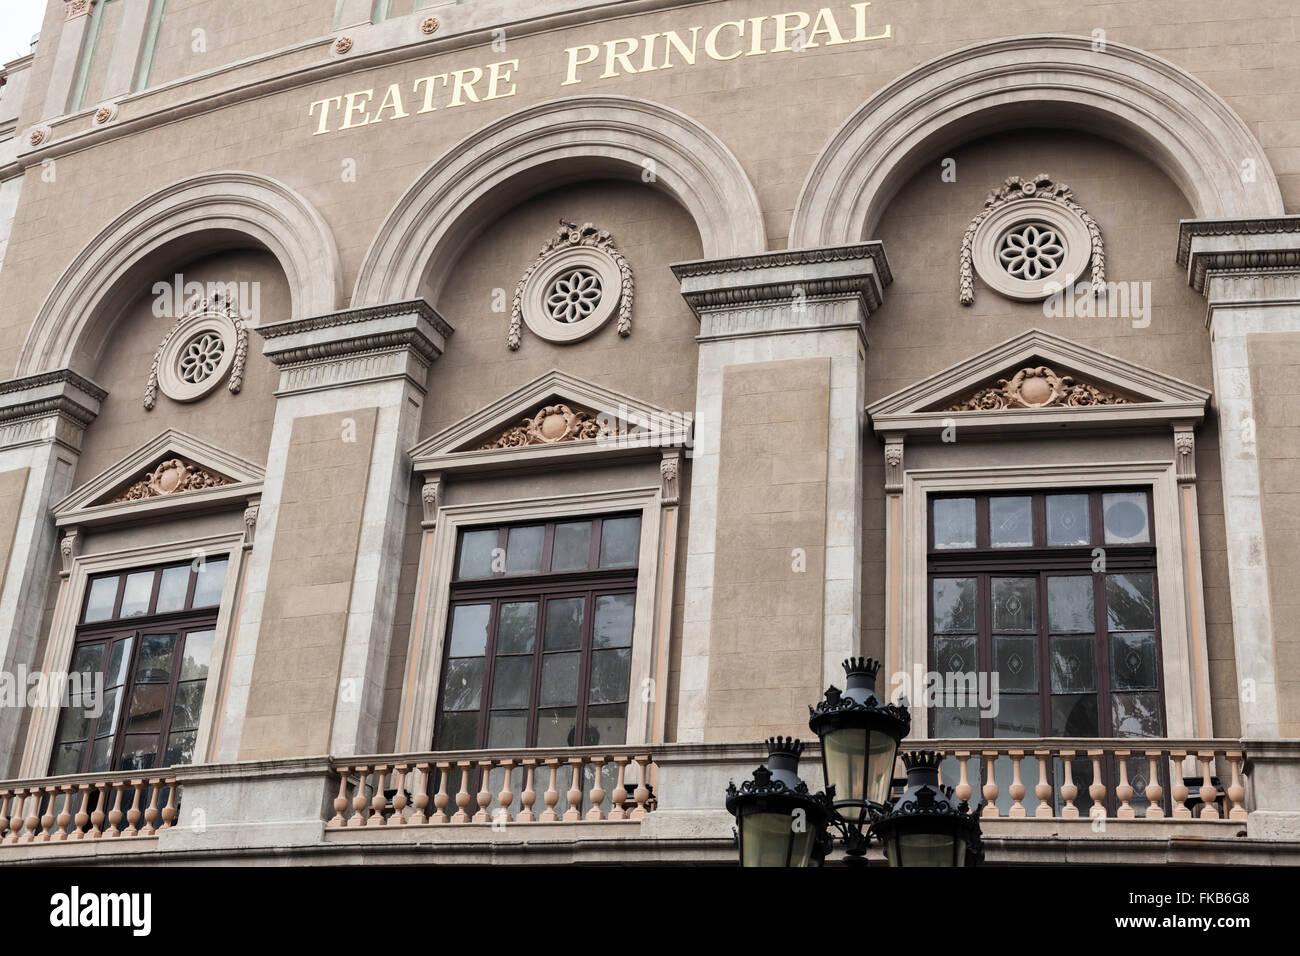 Teatre Principal, the oldest theater in the city, century XVI. La Rambla. Barcelona. - Stock Image